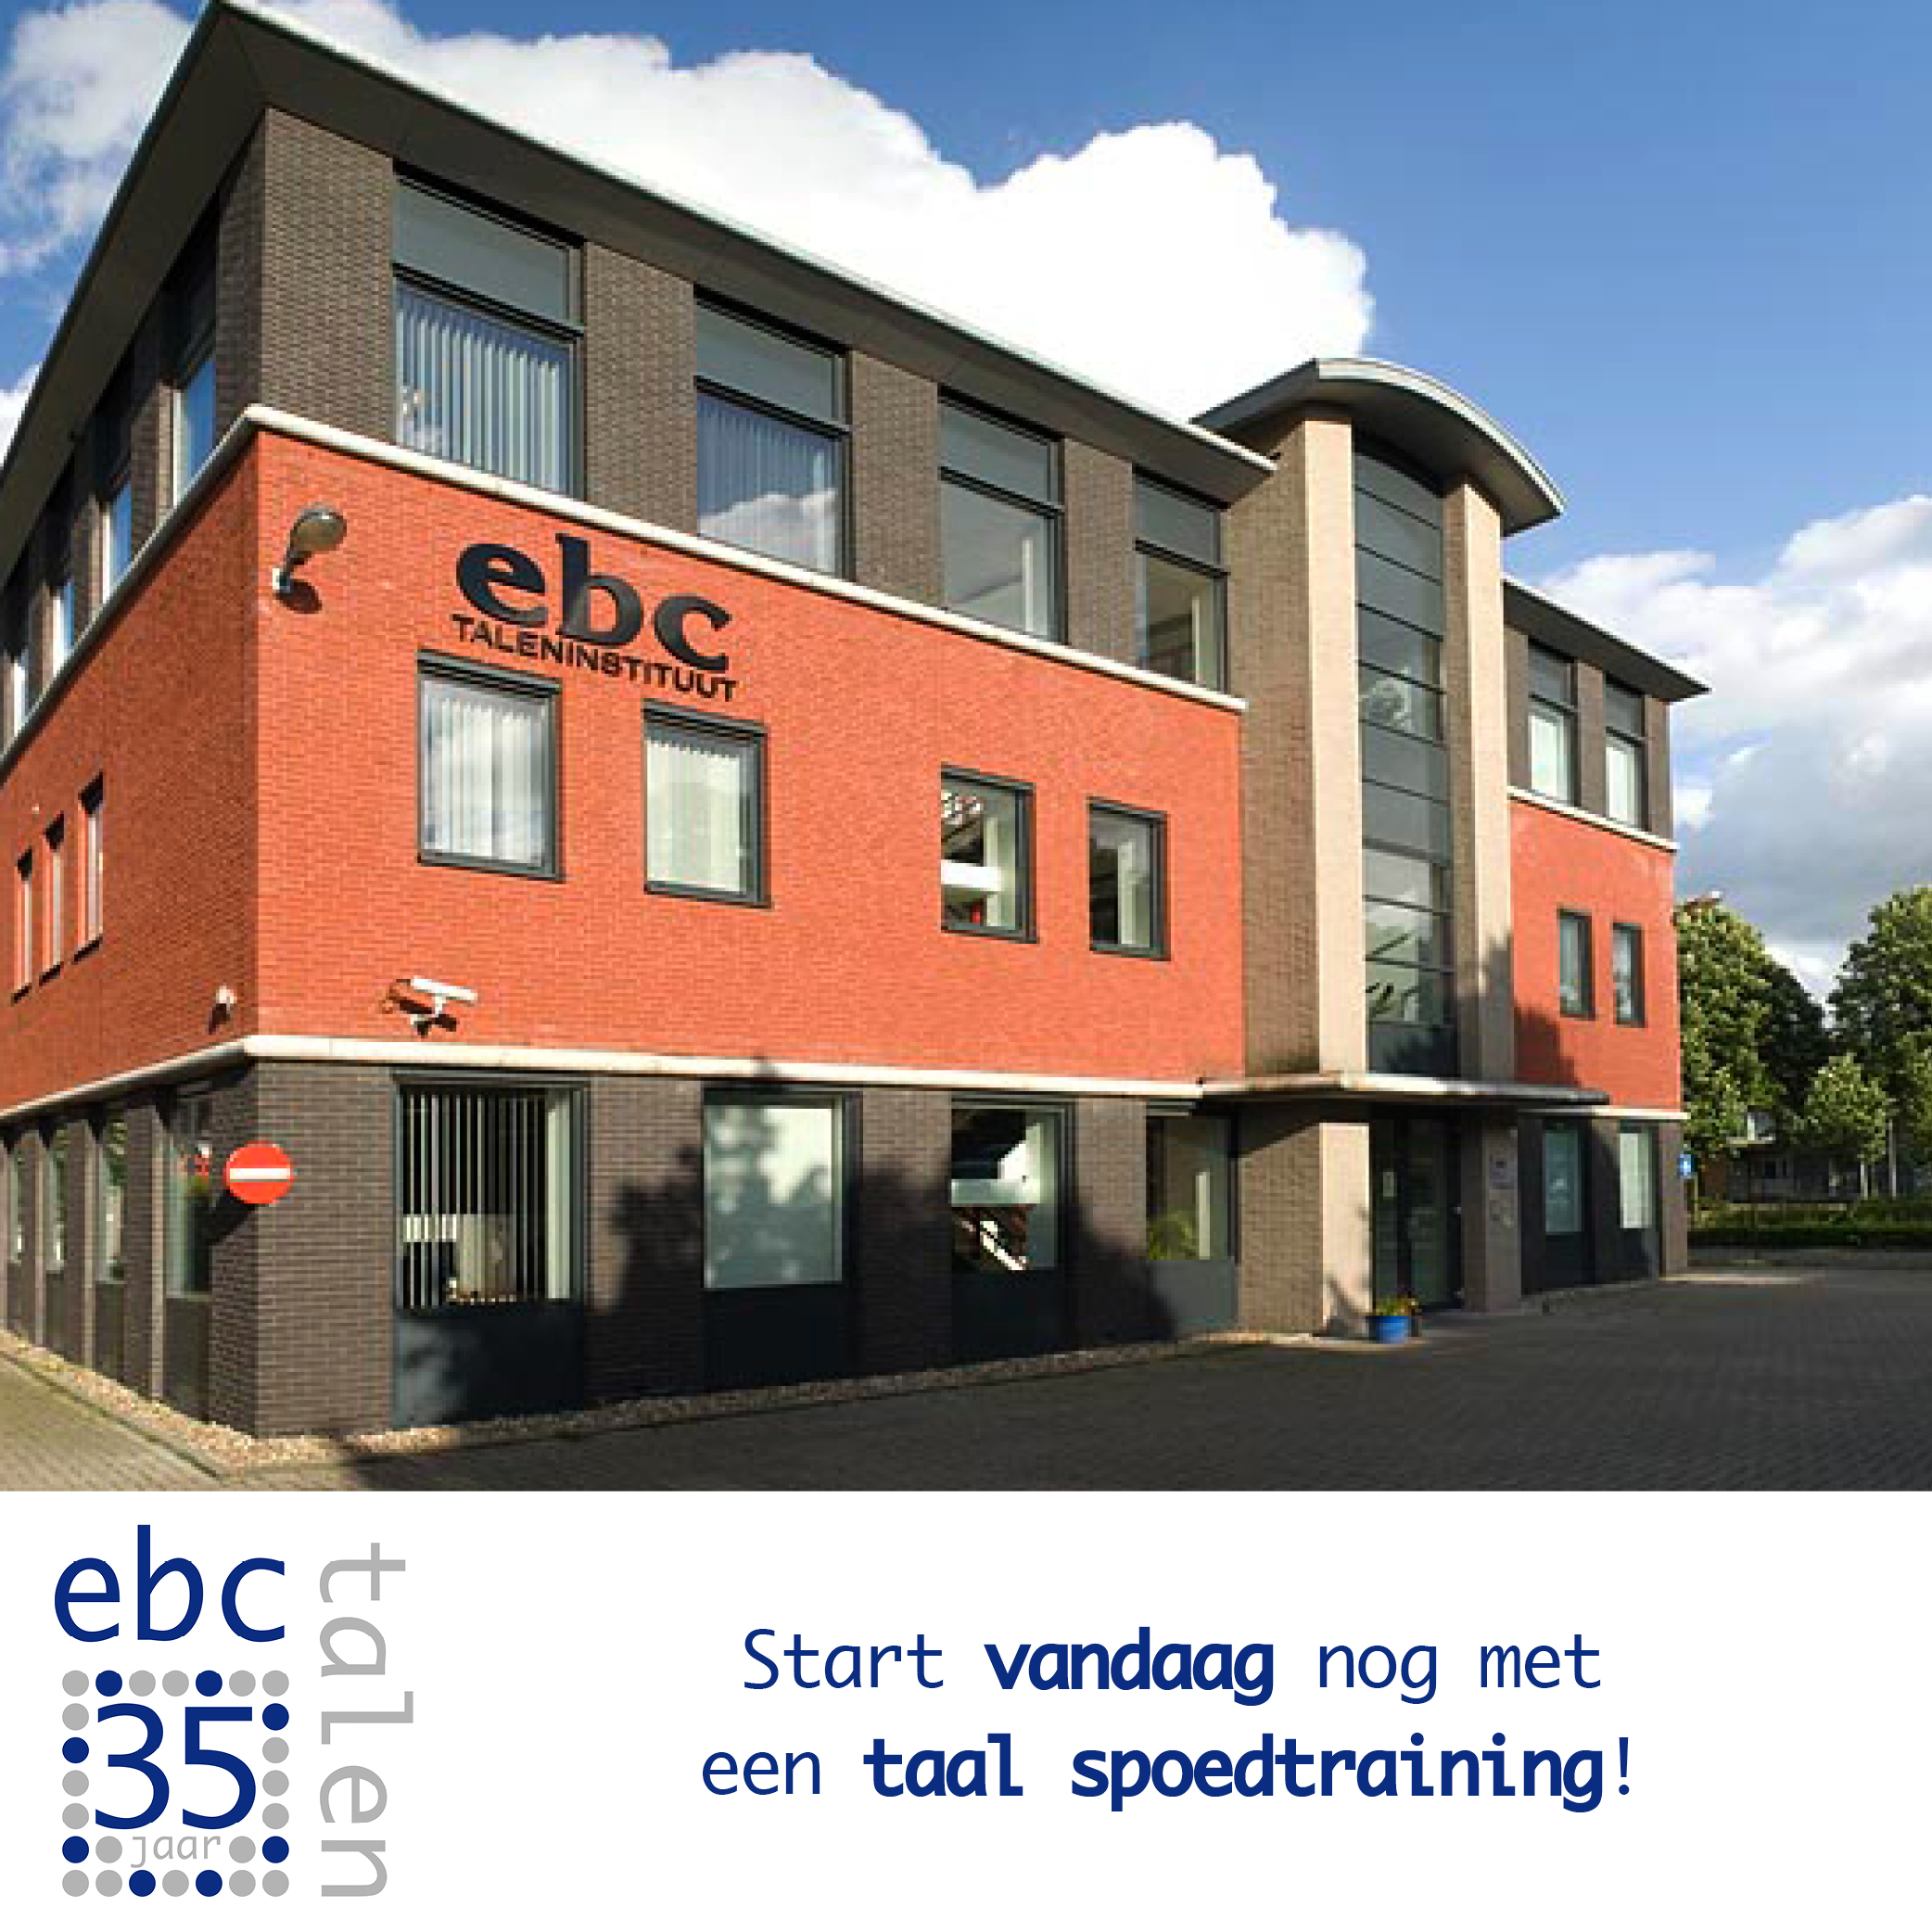 Spoed taaltraining bij EBC